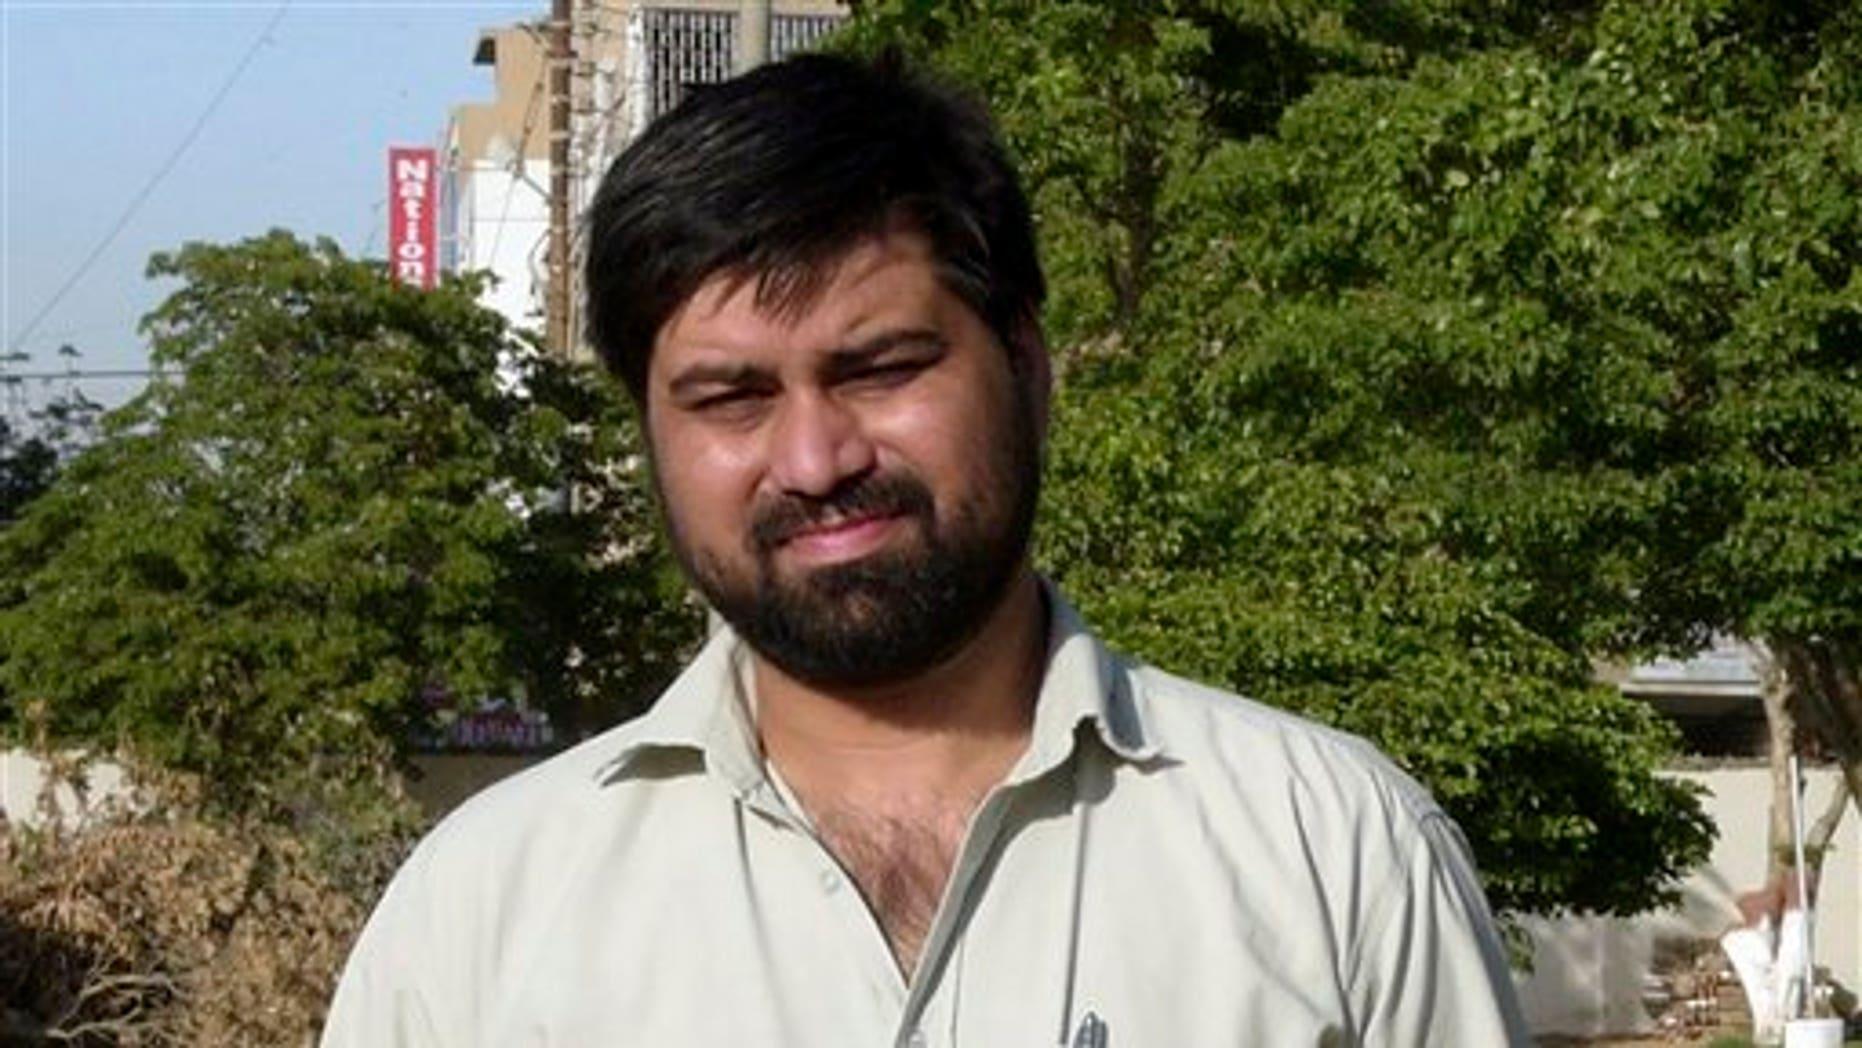 This undated photo provided by Adnkronos news agency shows Pakistani journalist and Adnkronos International correspondent Syed Saleem Shahzad.